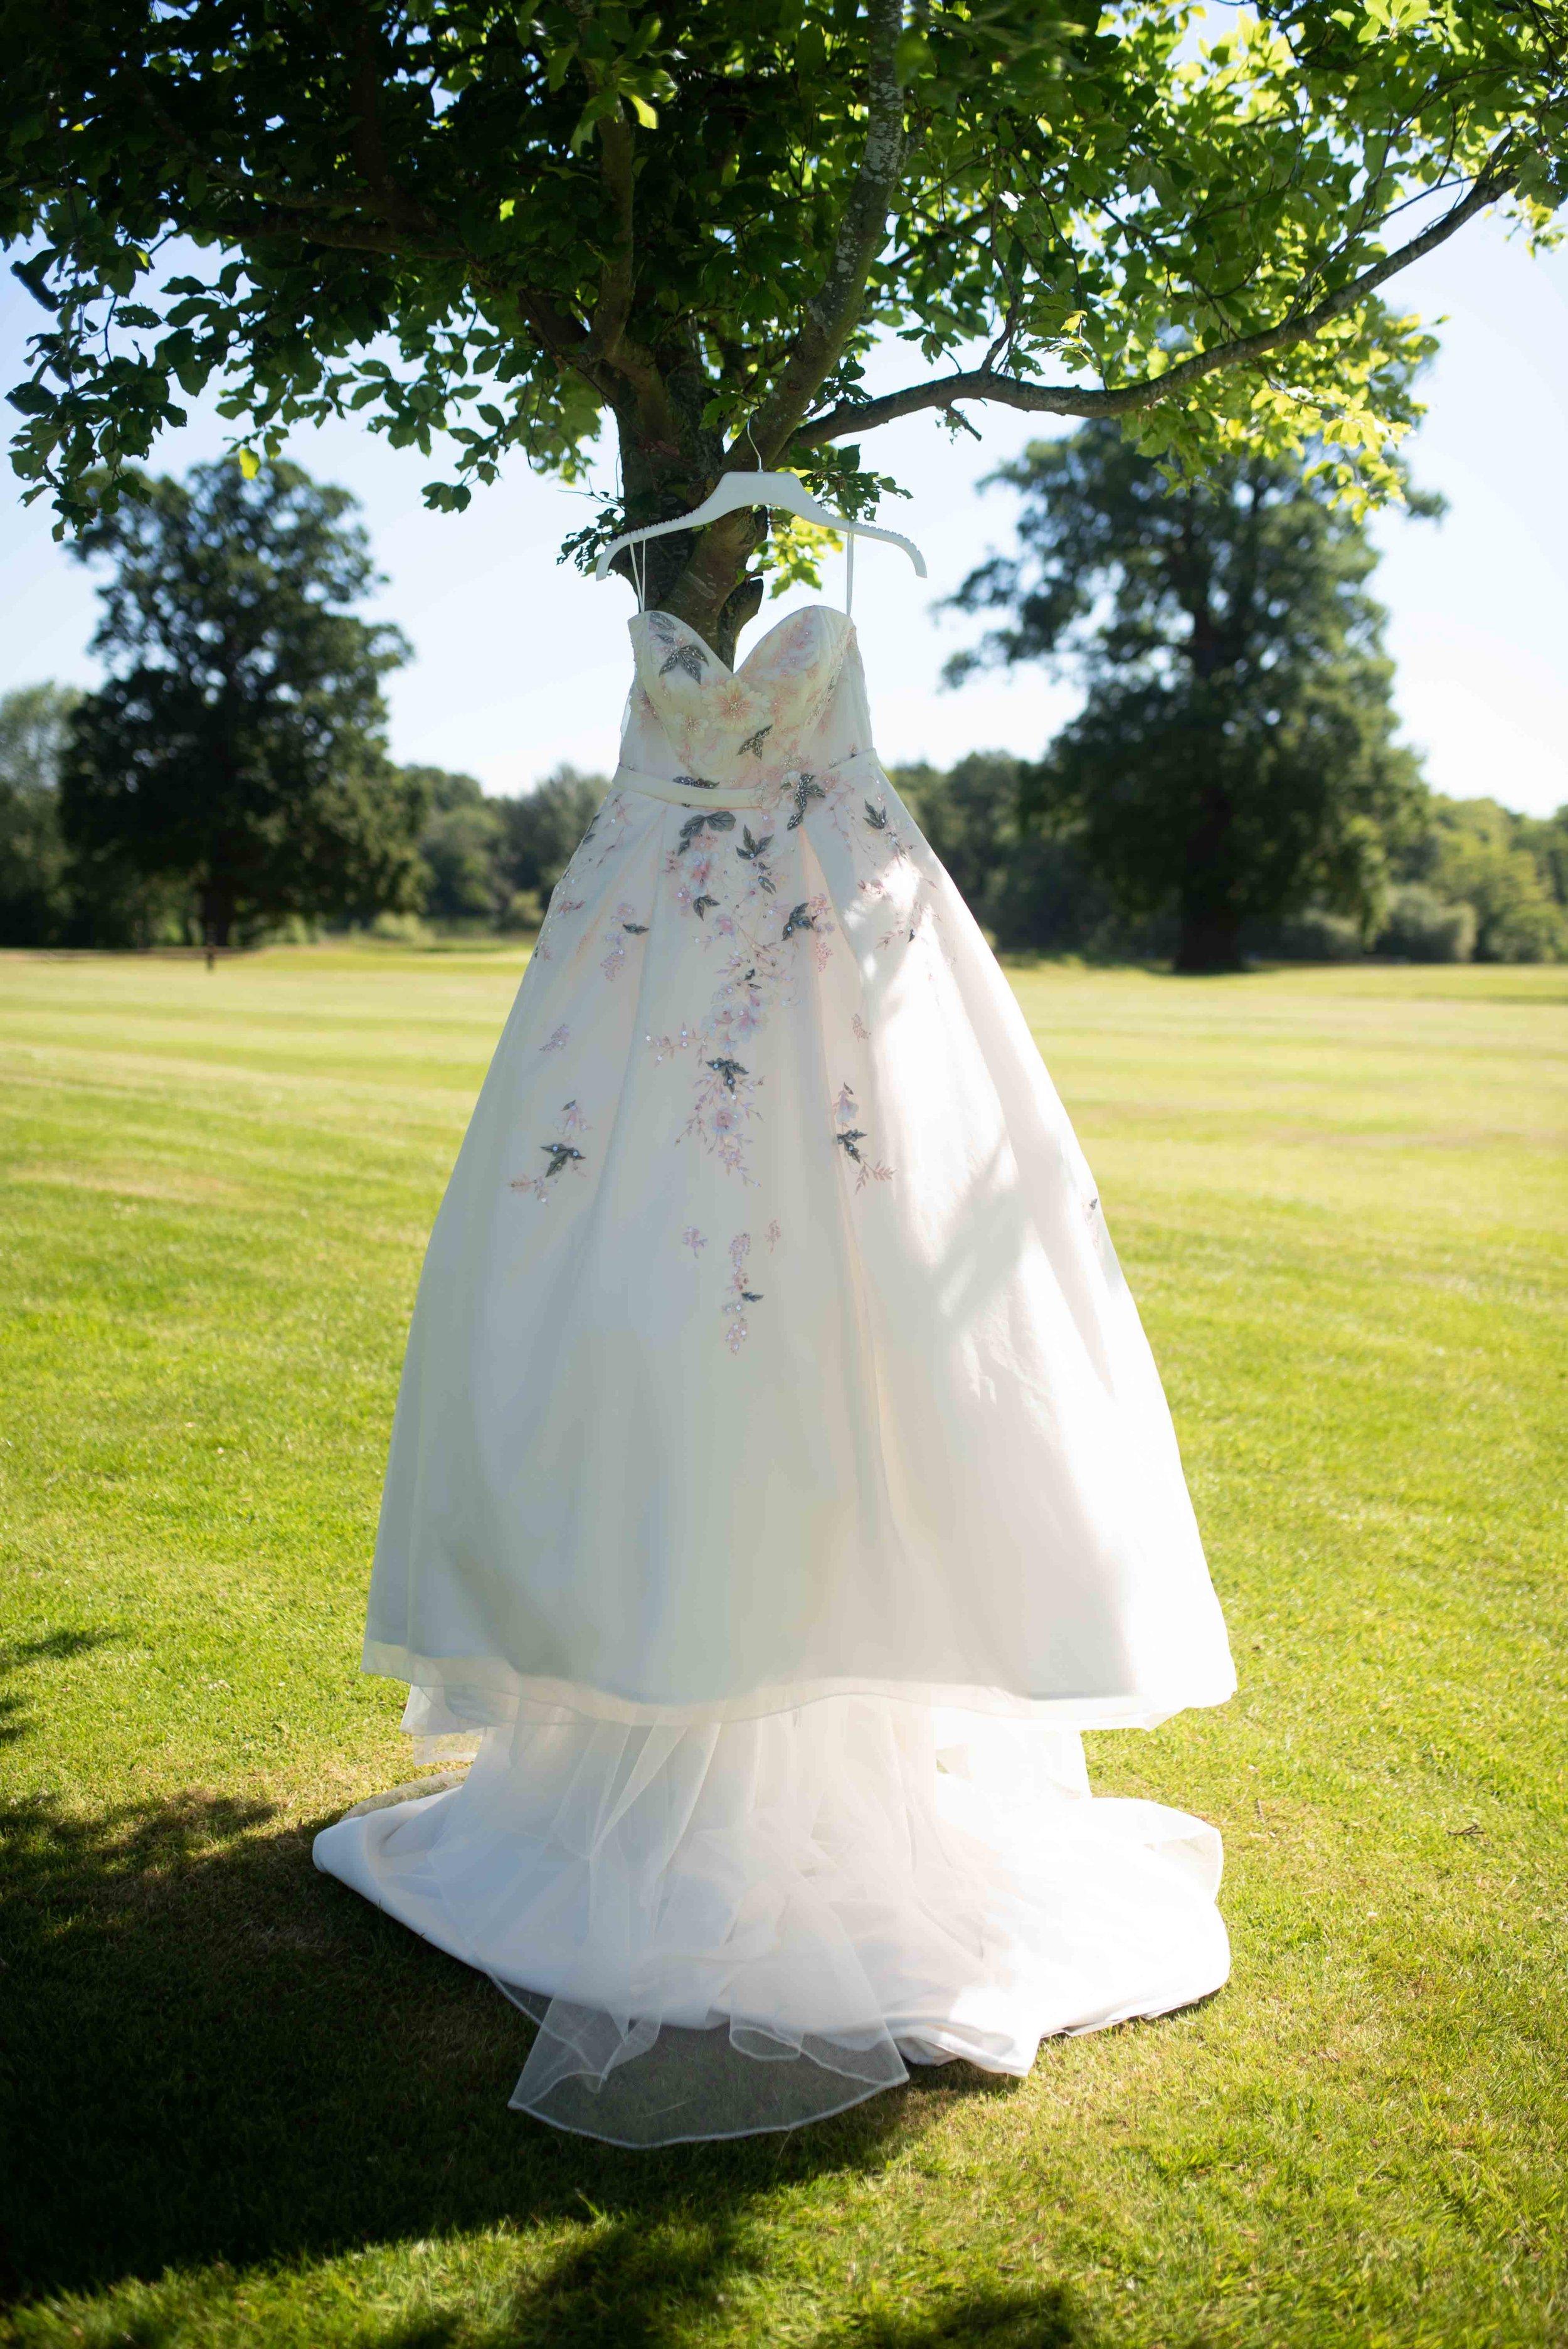 Lea-cooper-photography-wedding-photography-wolverhampton-patshull-park-hotel-wedding-pattingham-wolverhampton-west-midlands-uk-16.JPG